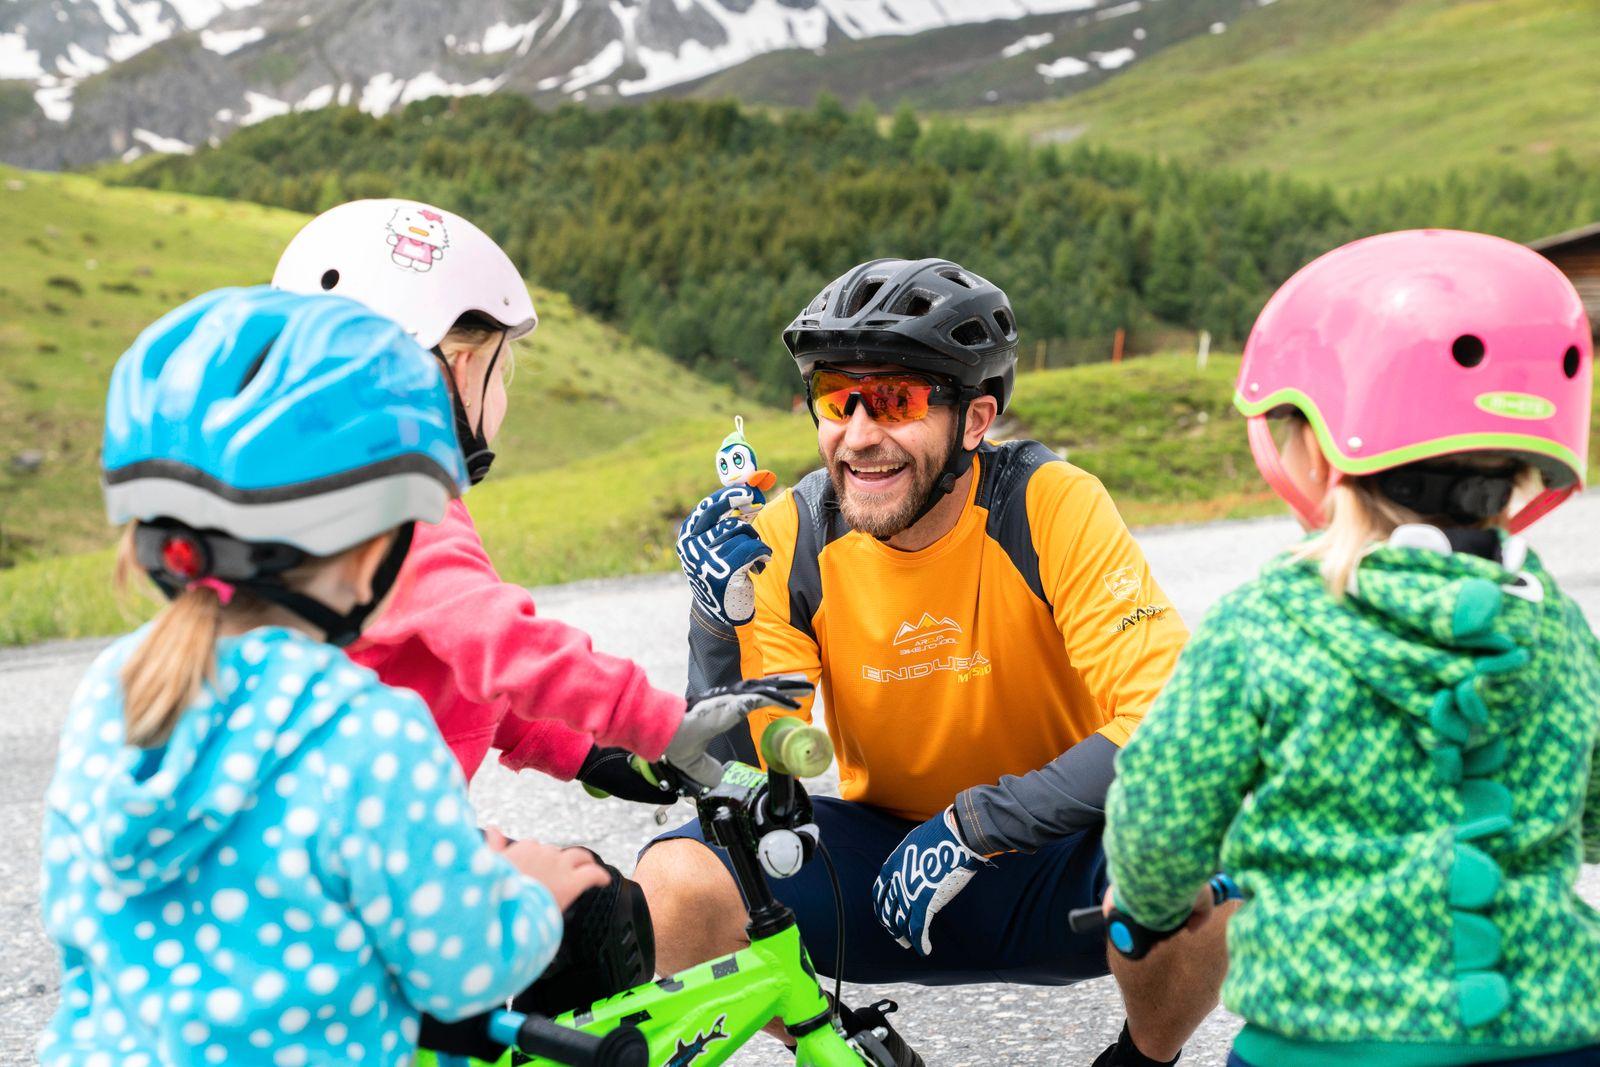 Arosa Bikeschool